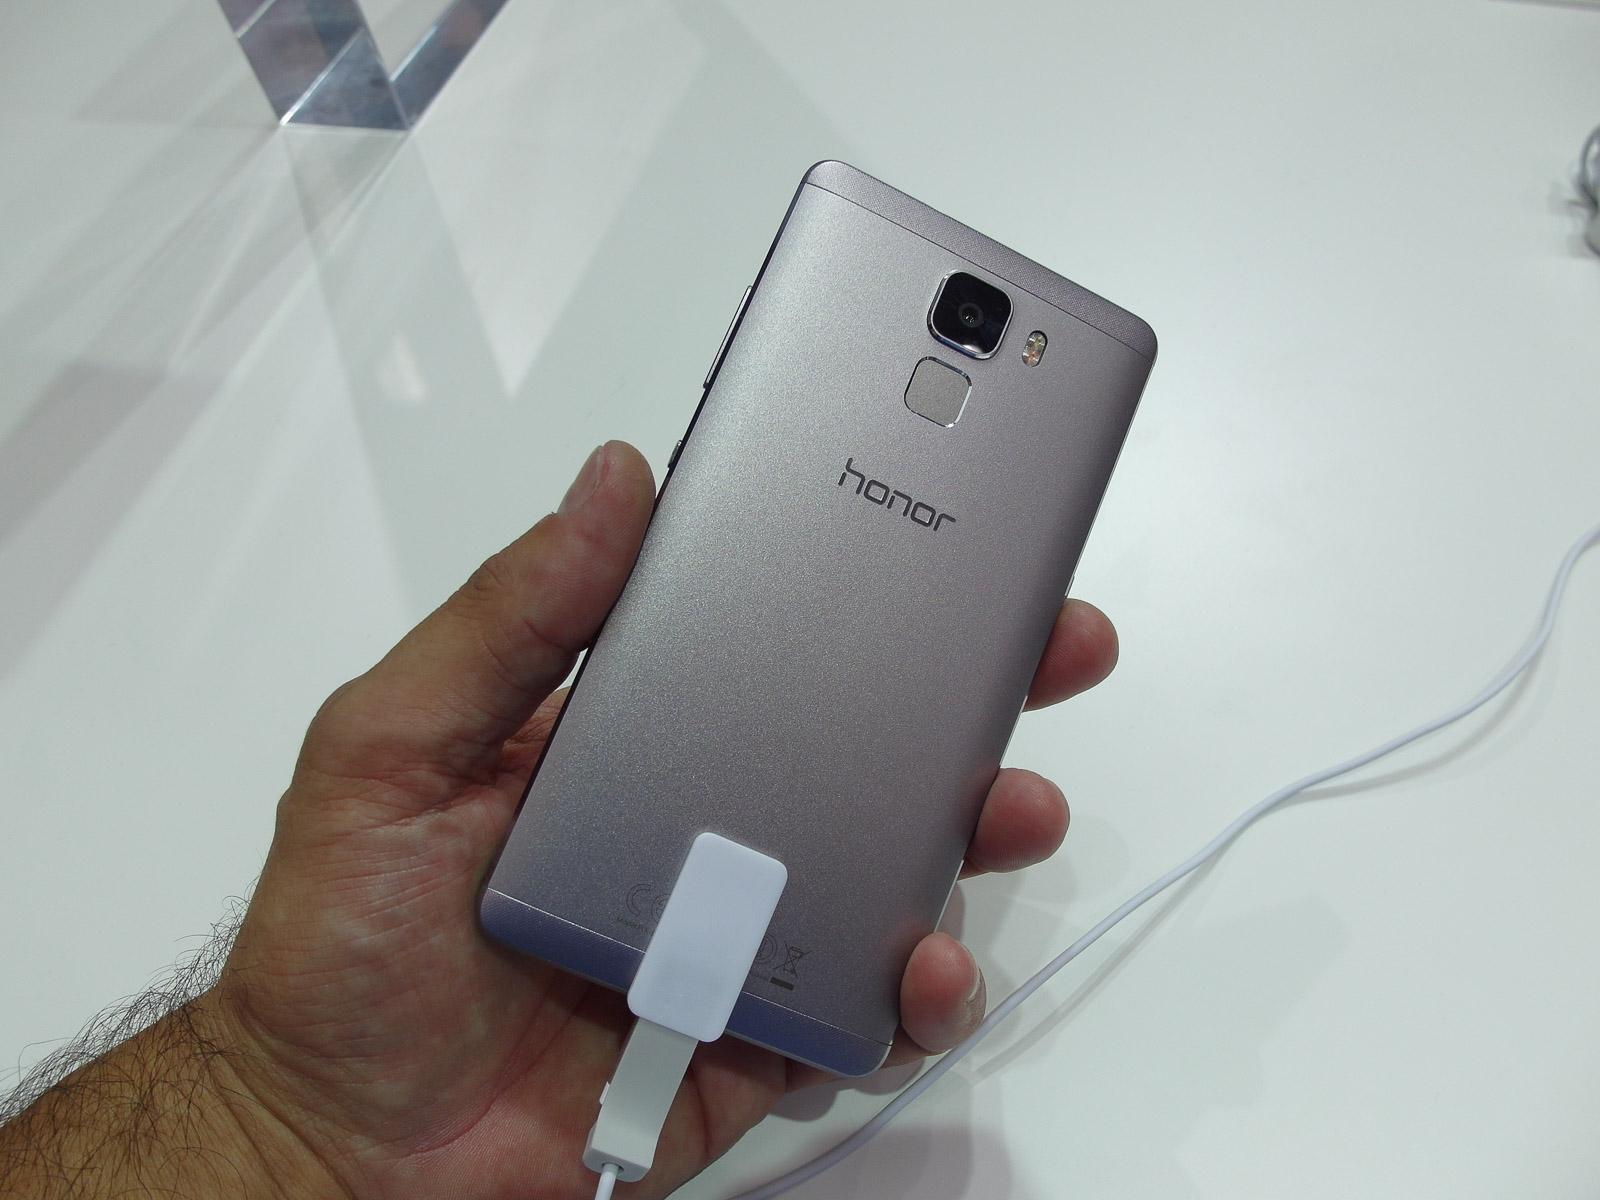 huawei_honor_7_smartphone_003